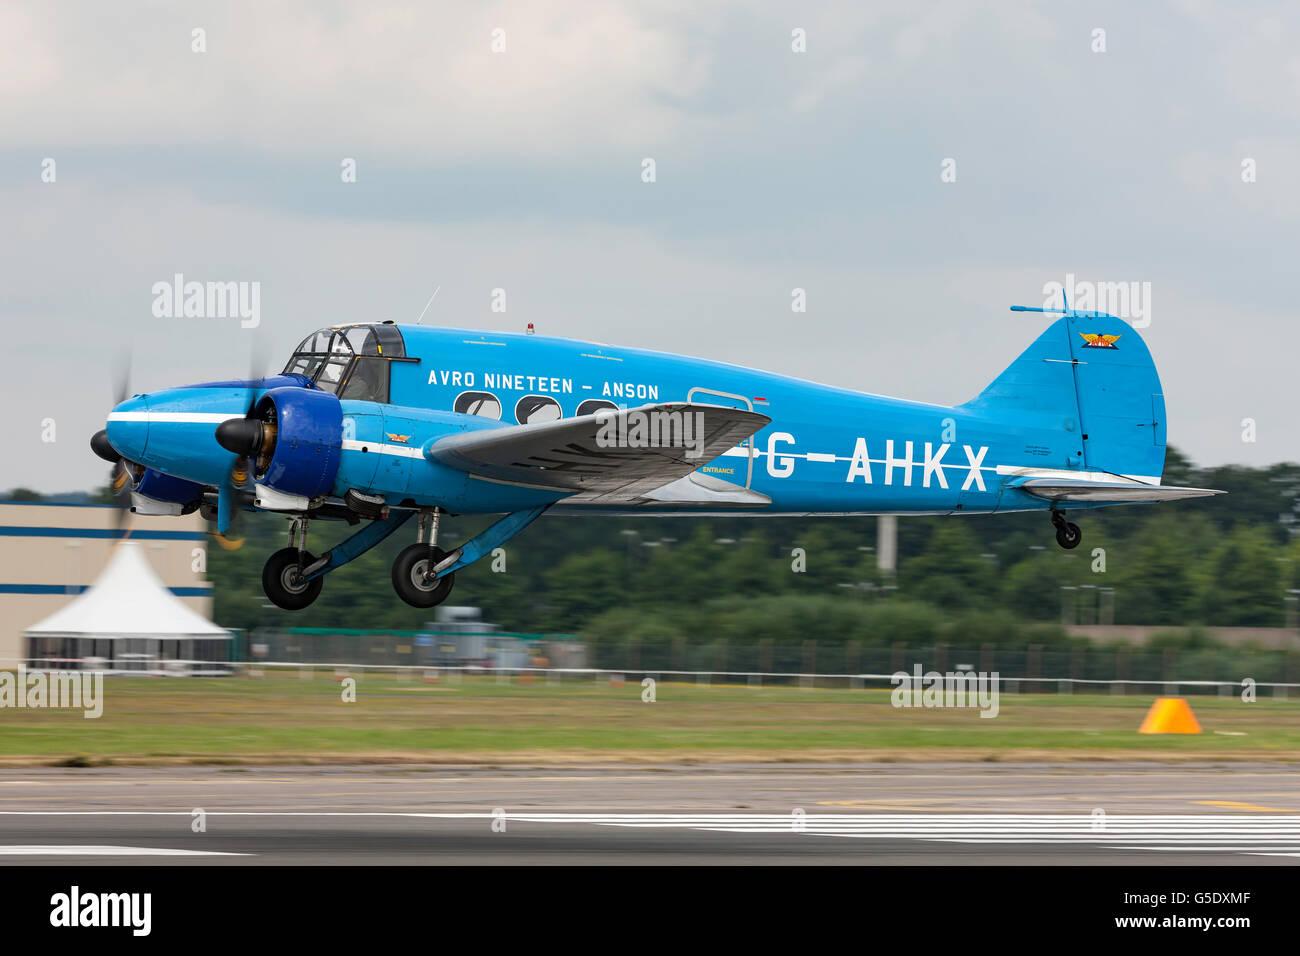 Avro 652A Anson G-AHKX at the Farnborough International Airshow - Stock Image